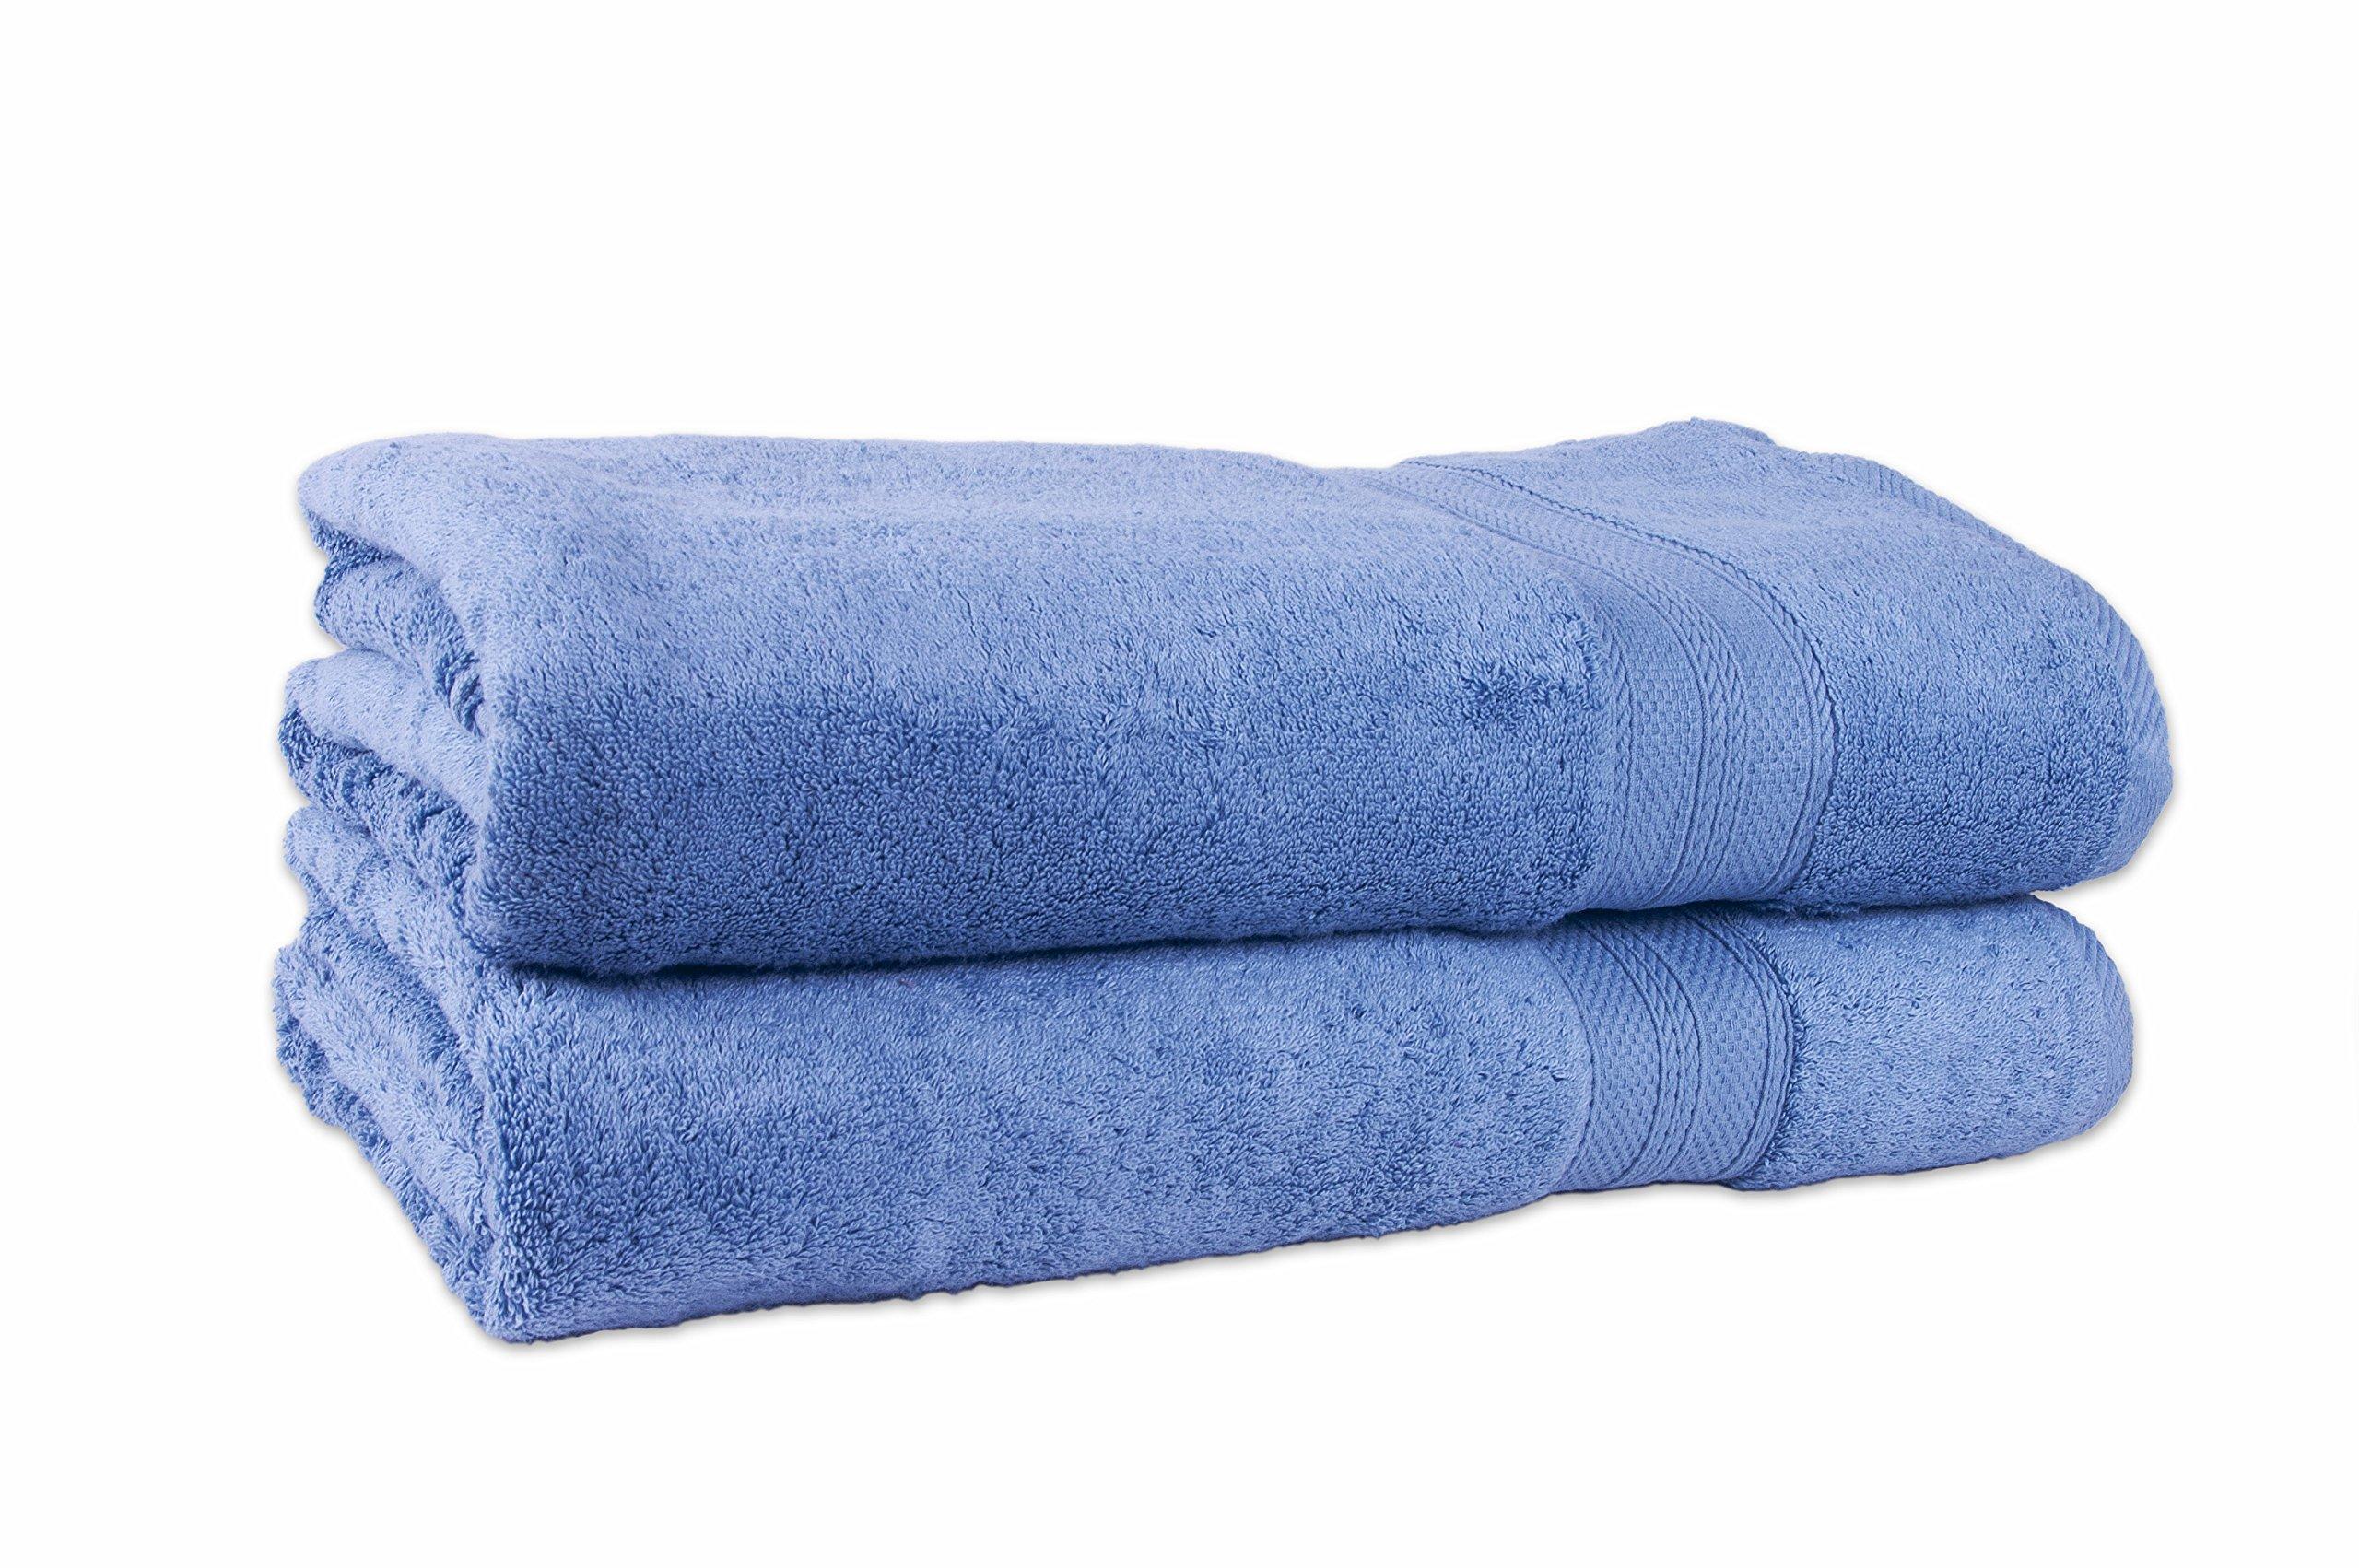 Revere Mills Boutique 2pc Bath Sheet Marine Wash,